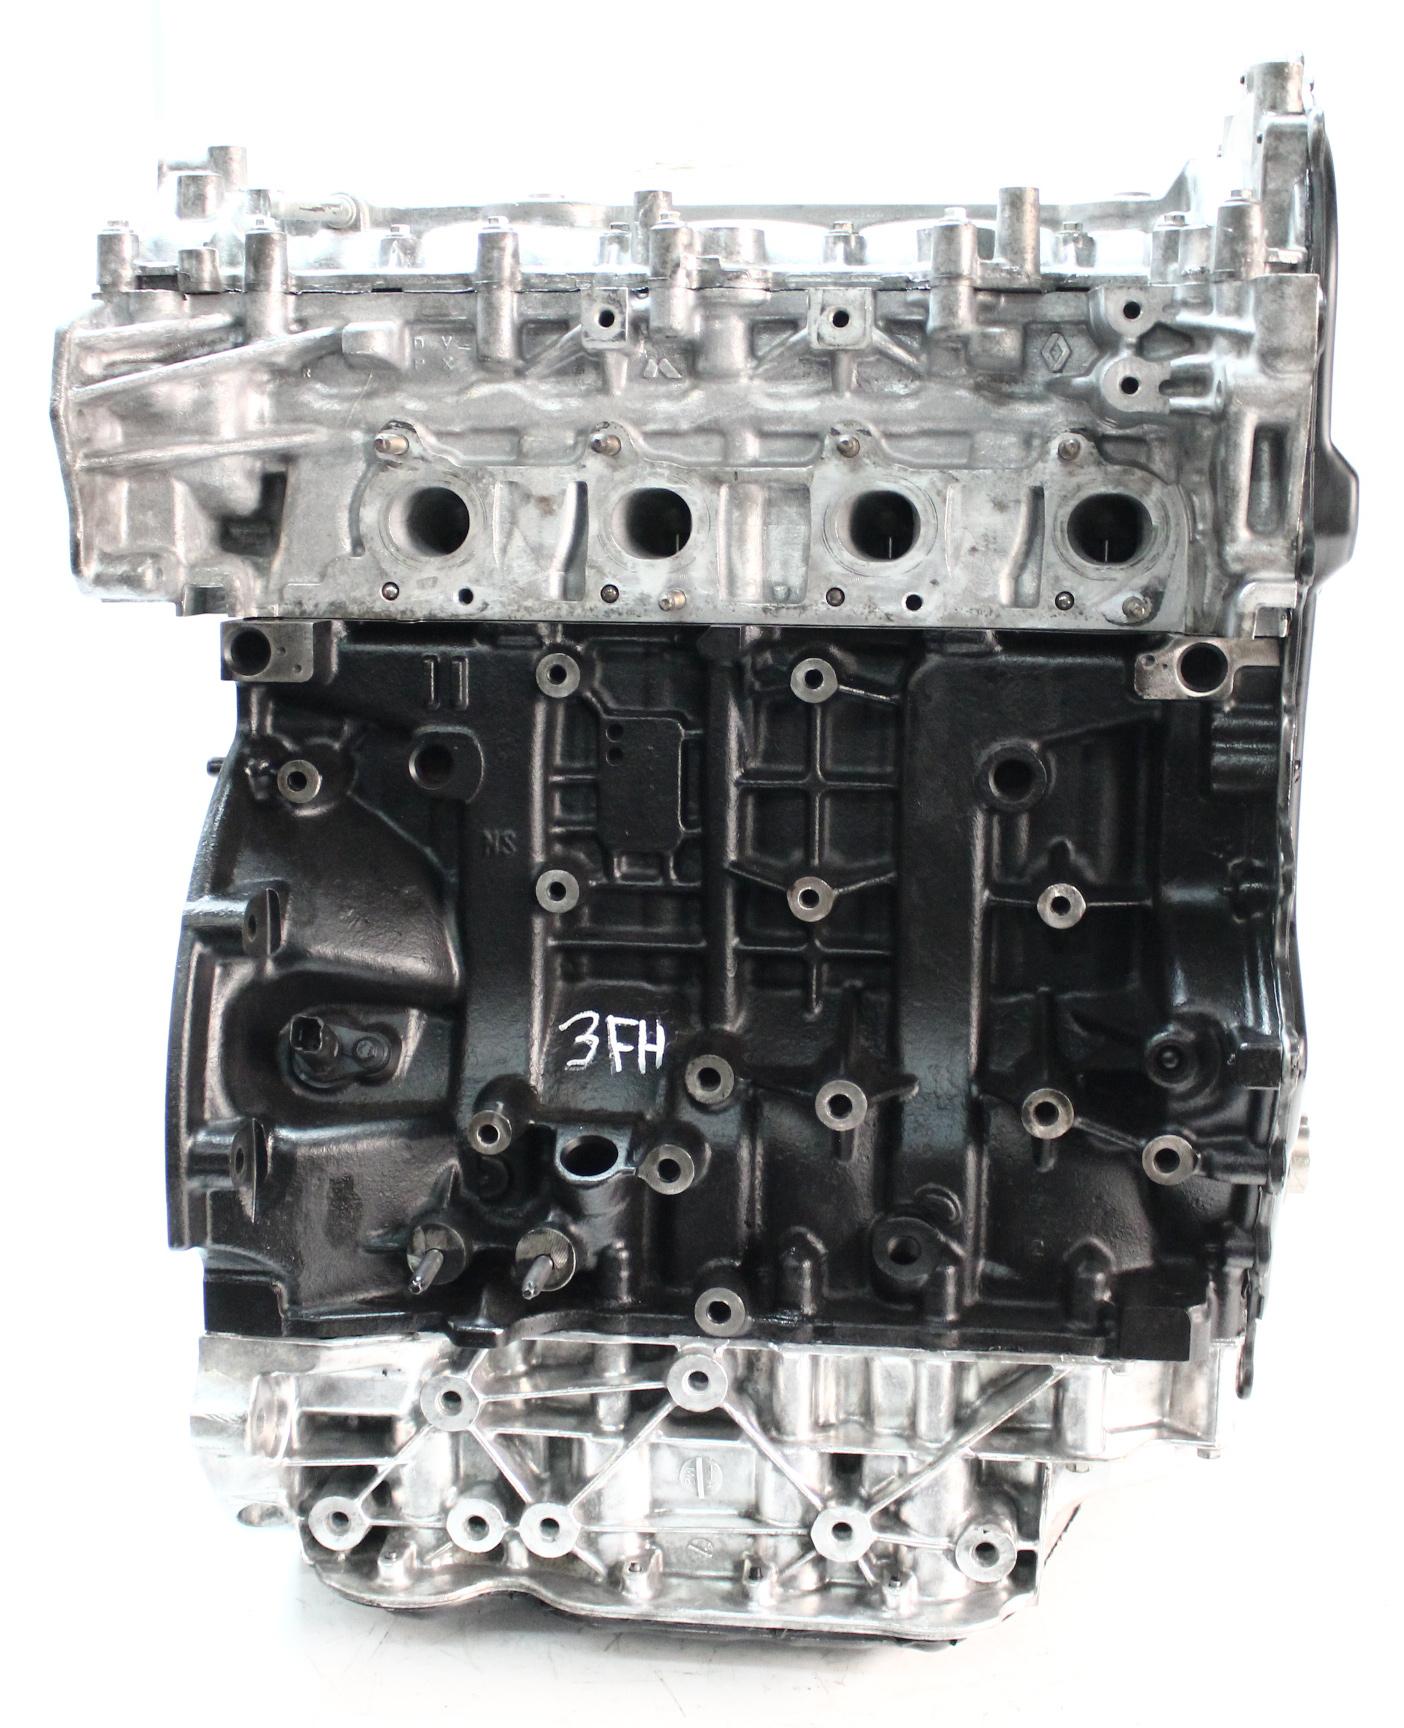 Motor 2010 Opel Renault für Nissan 2,0 dCi Diesel M9R M9R786